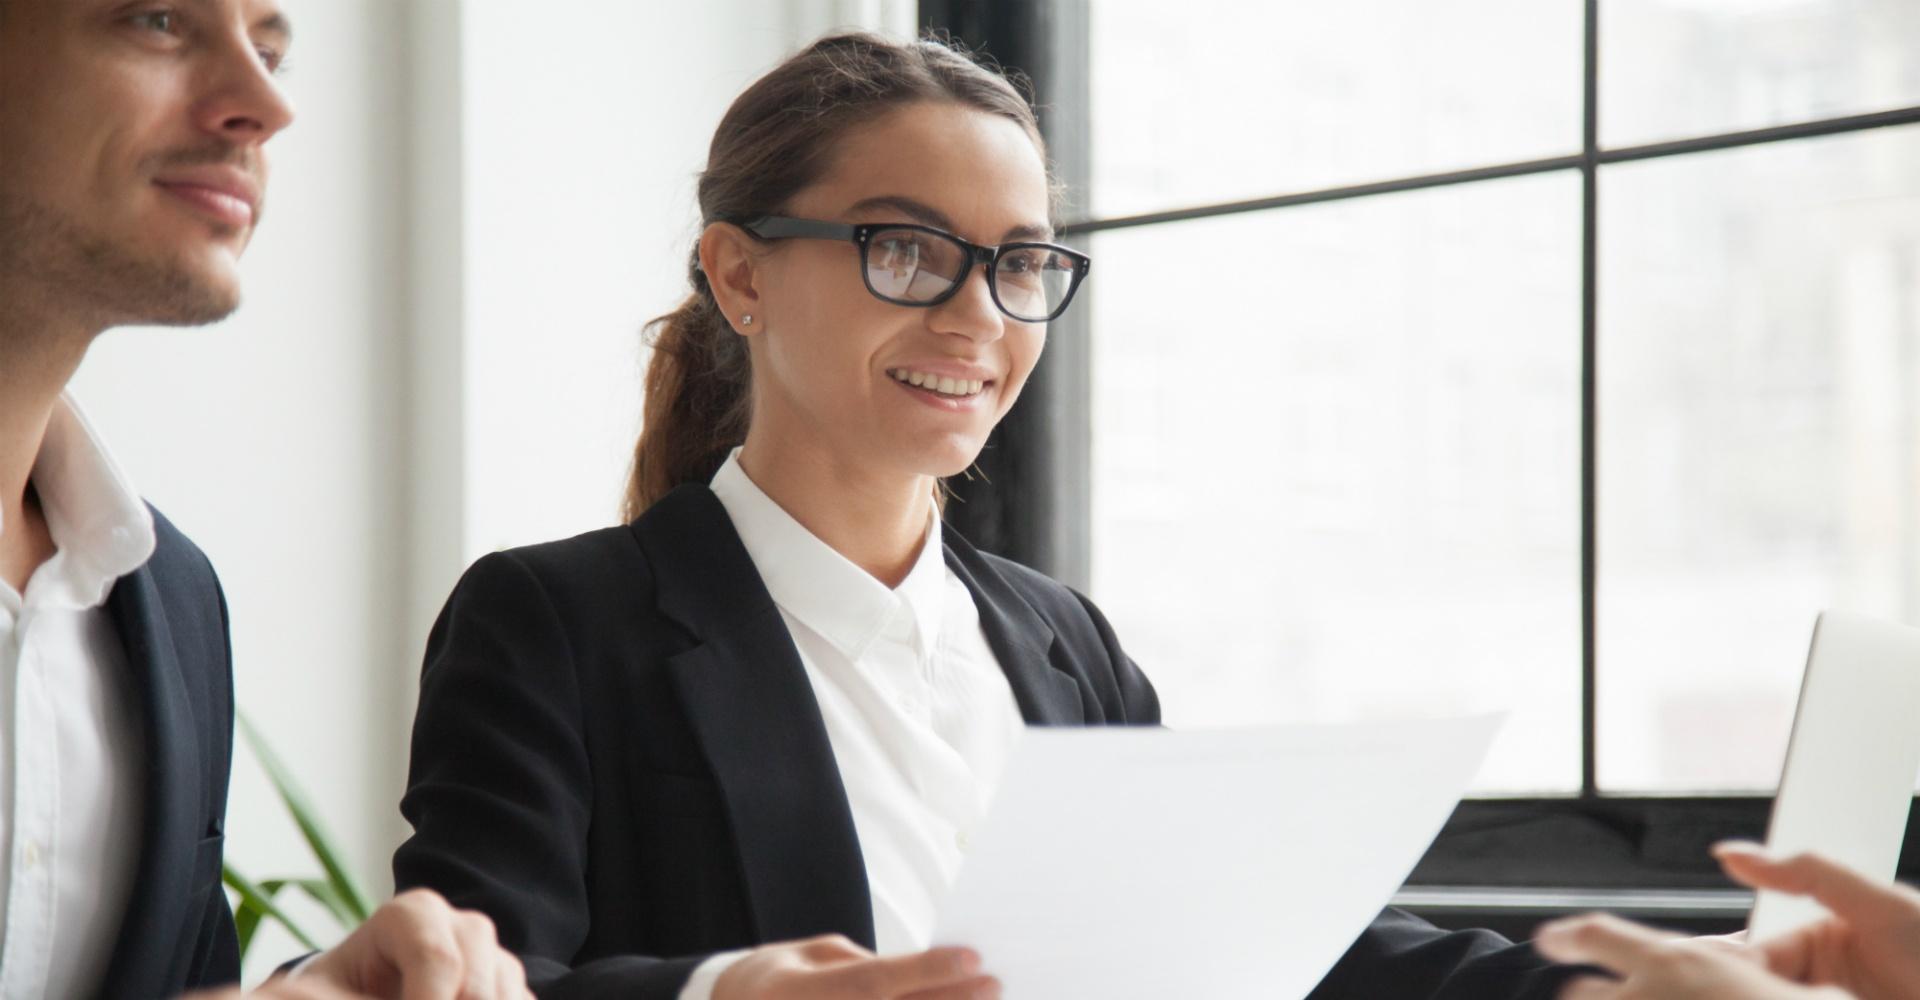 8 Traits of an Effective Technical Recruiter